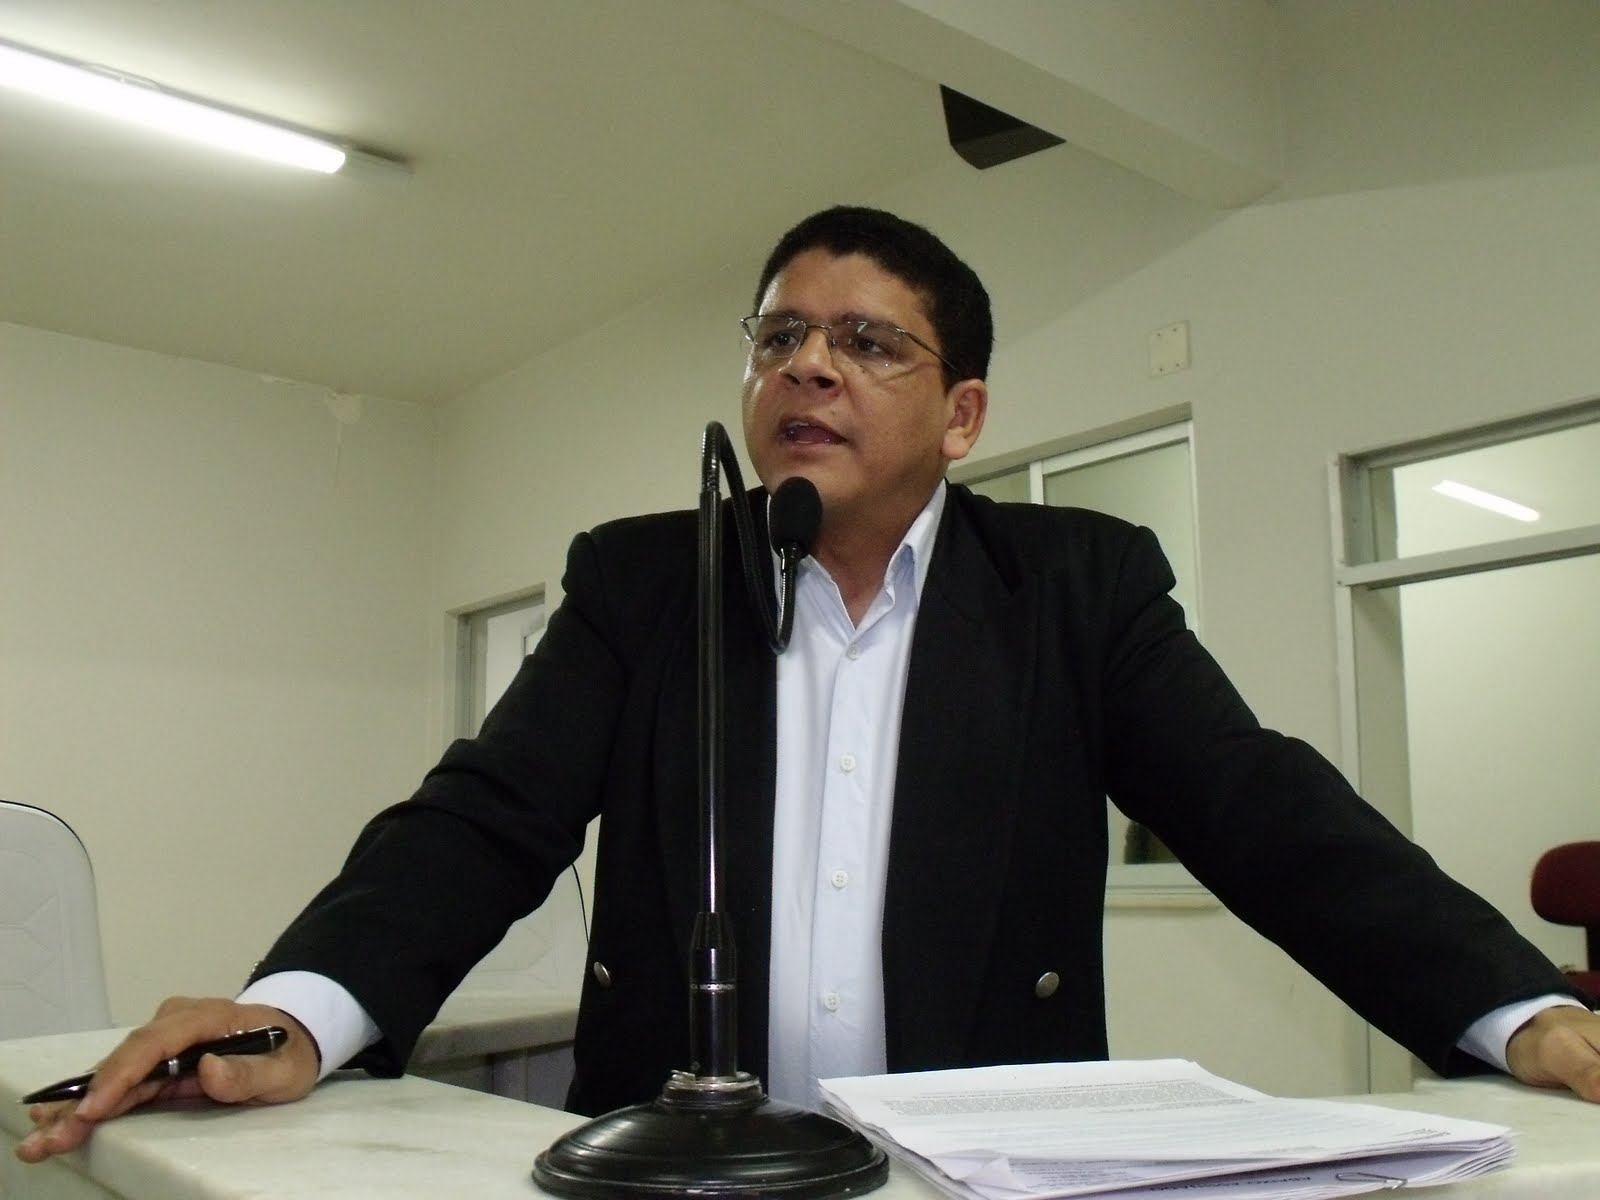 Edmilson Sanches ministra palestras no aniversário da Academia Parauapebense de Letras